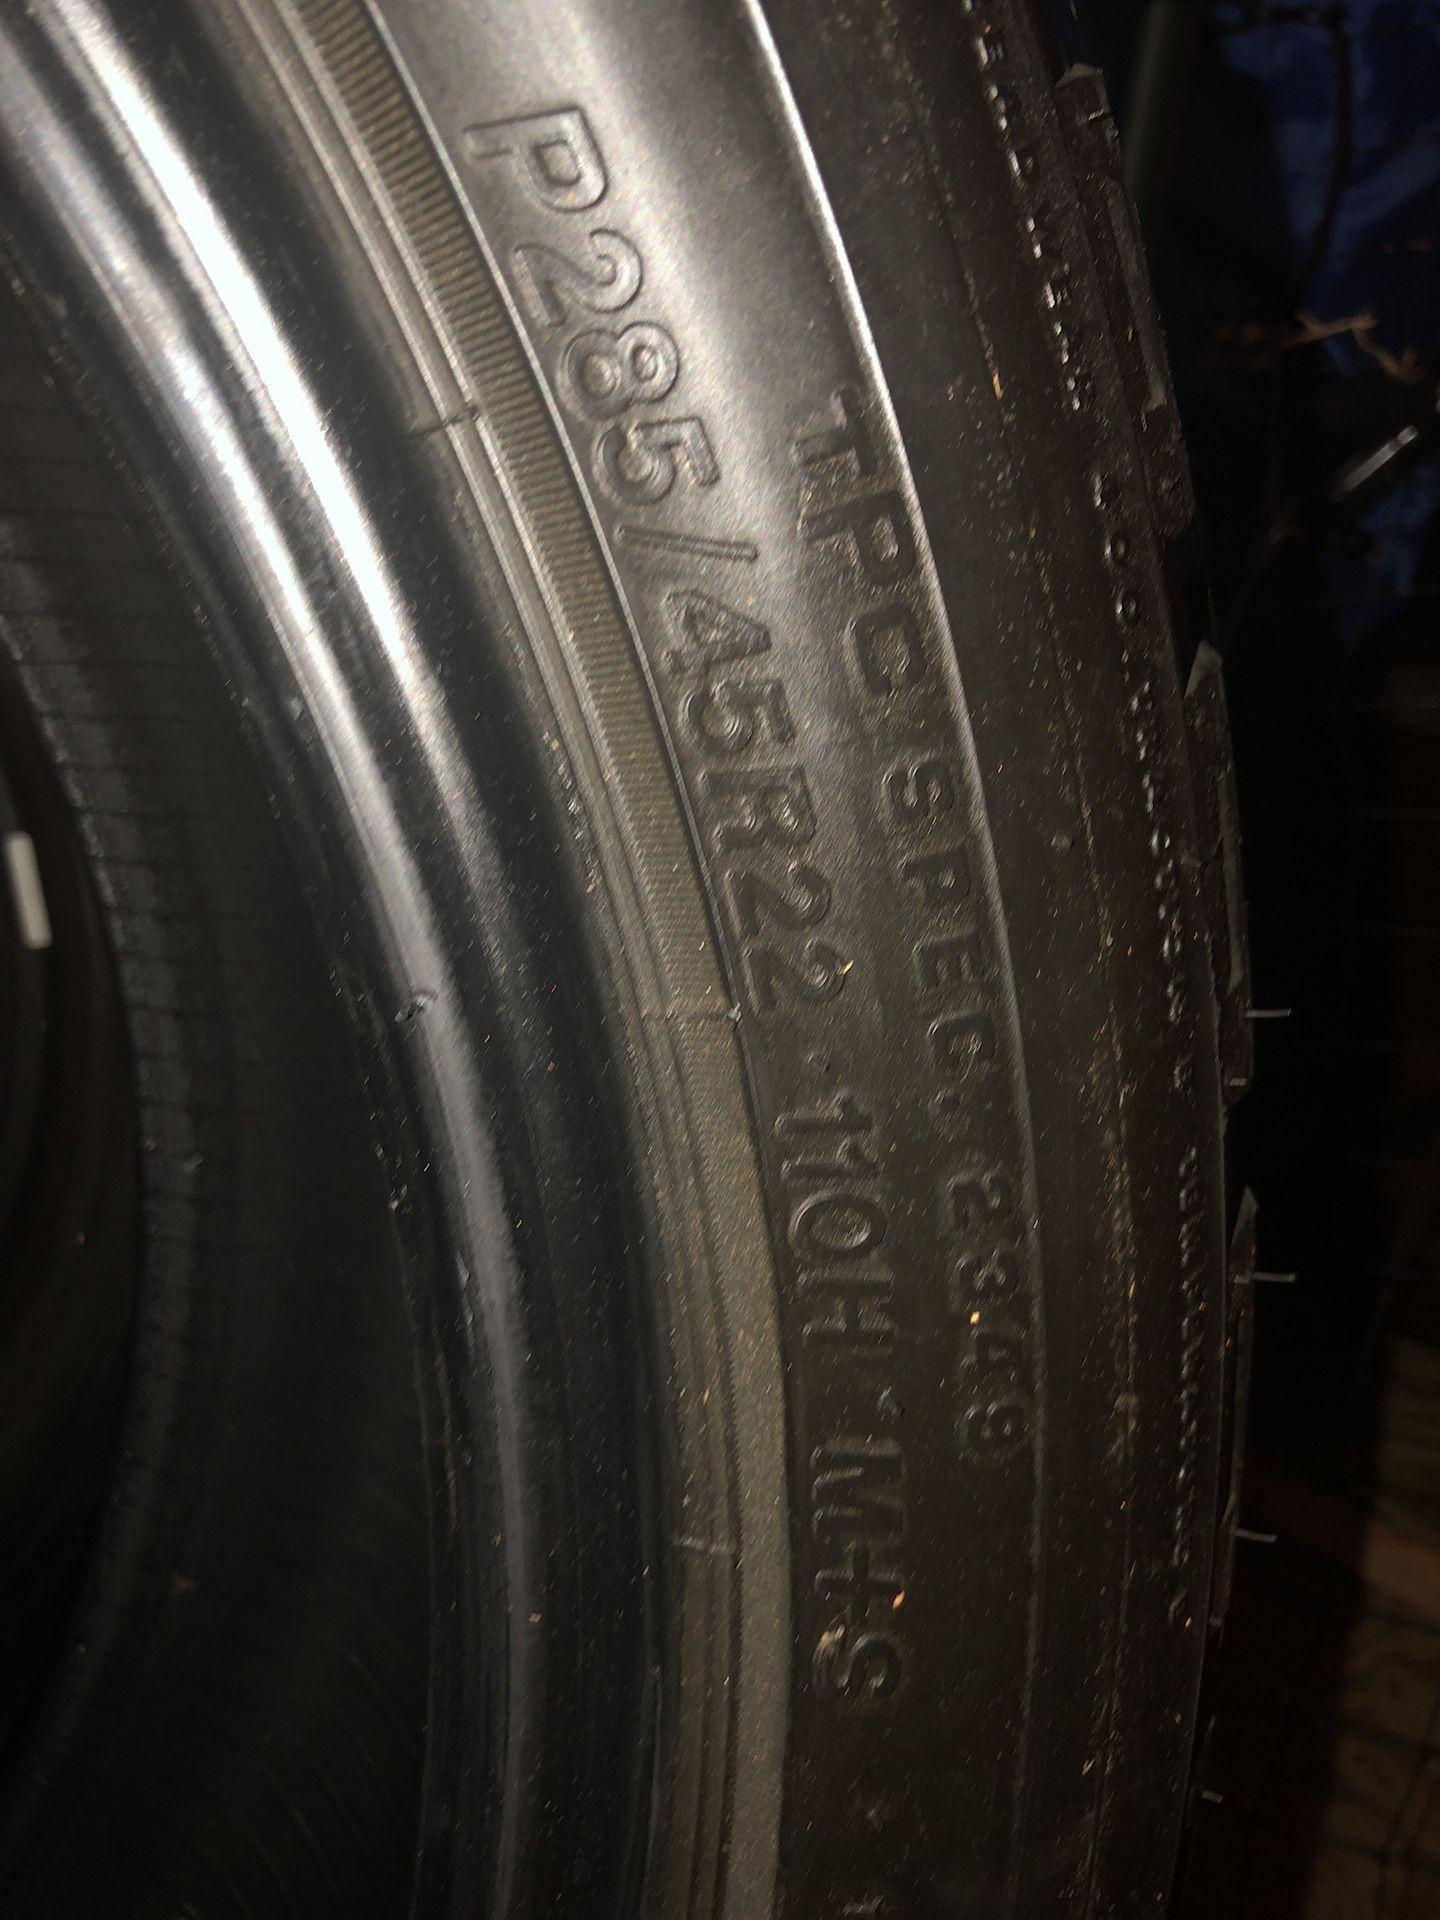 Dueler Bridgestone 22s off a GMC Denali $170